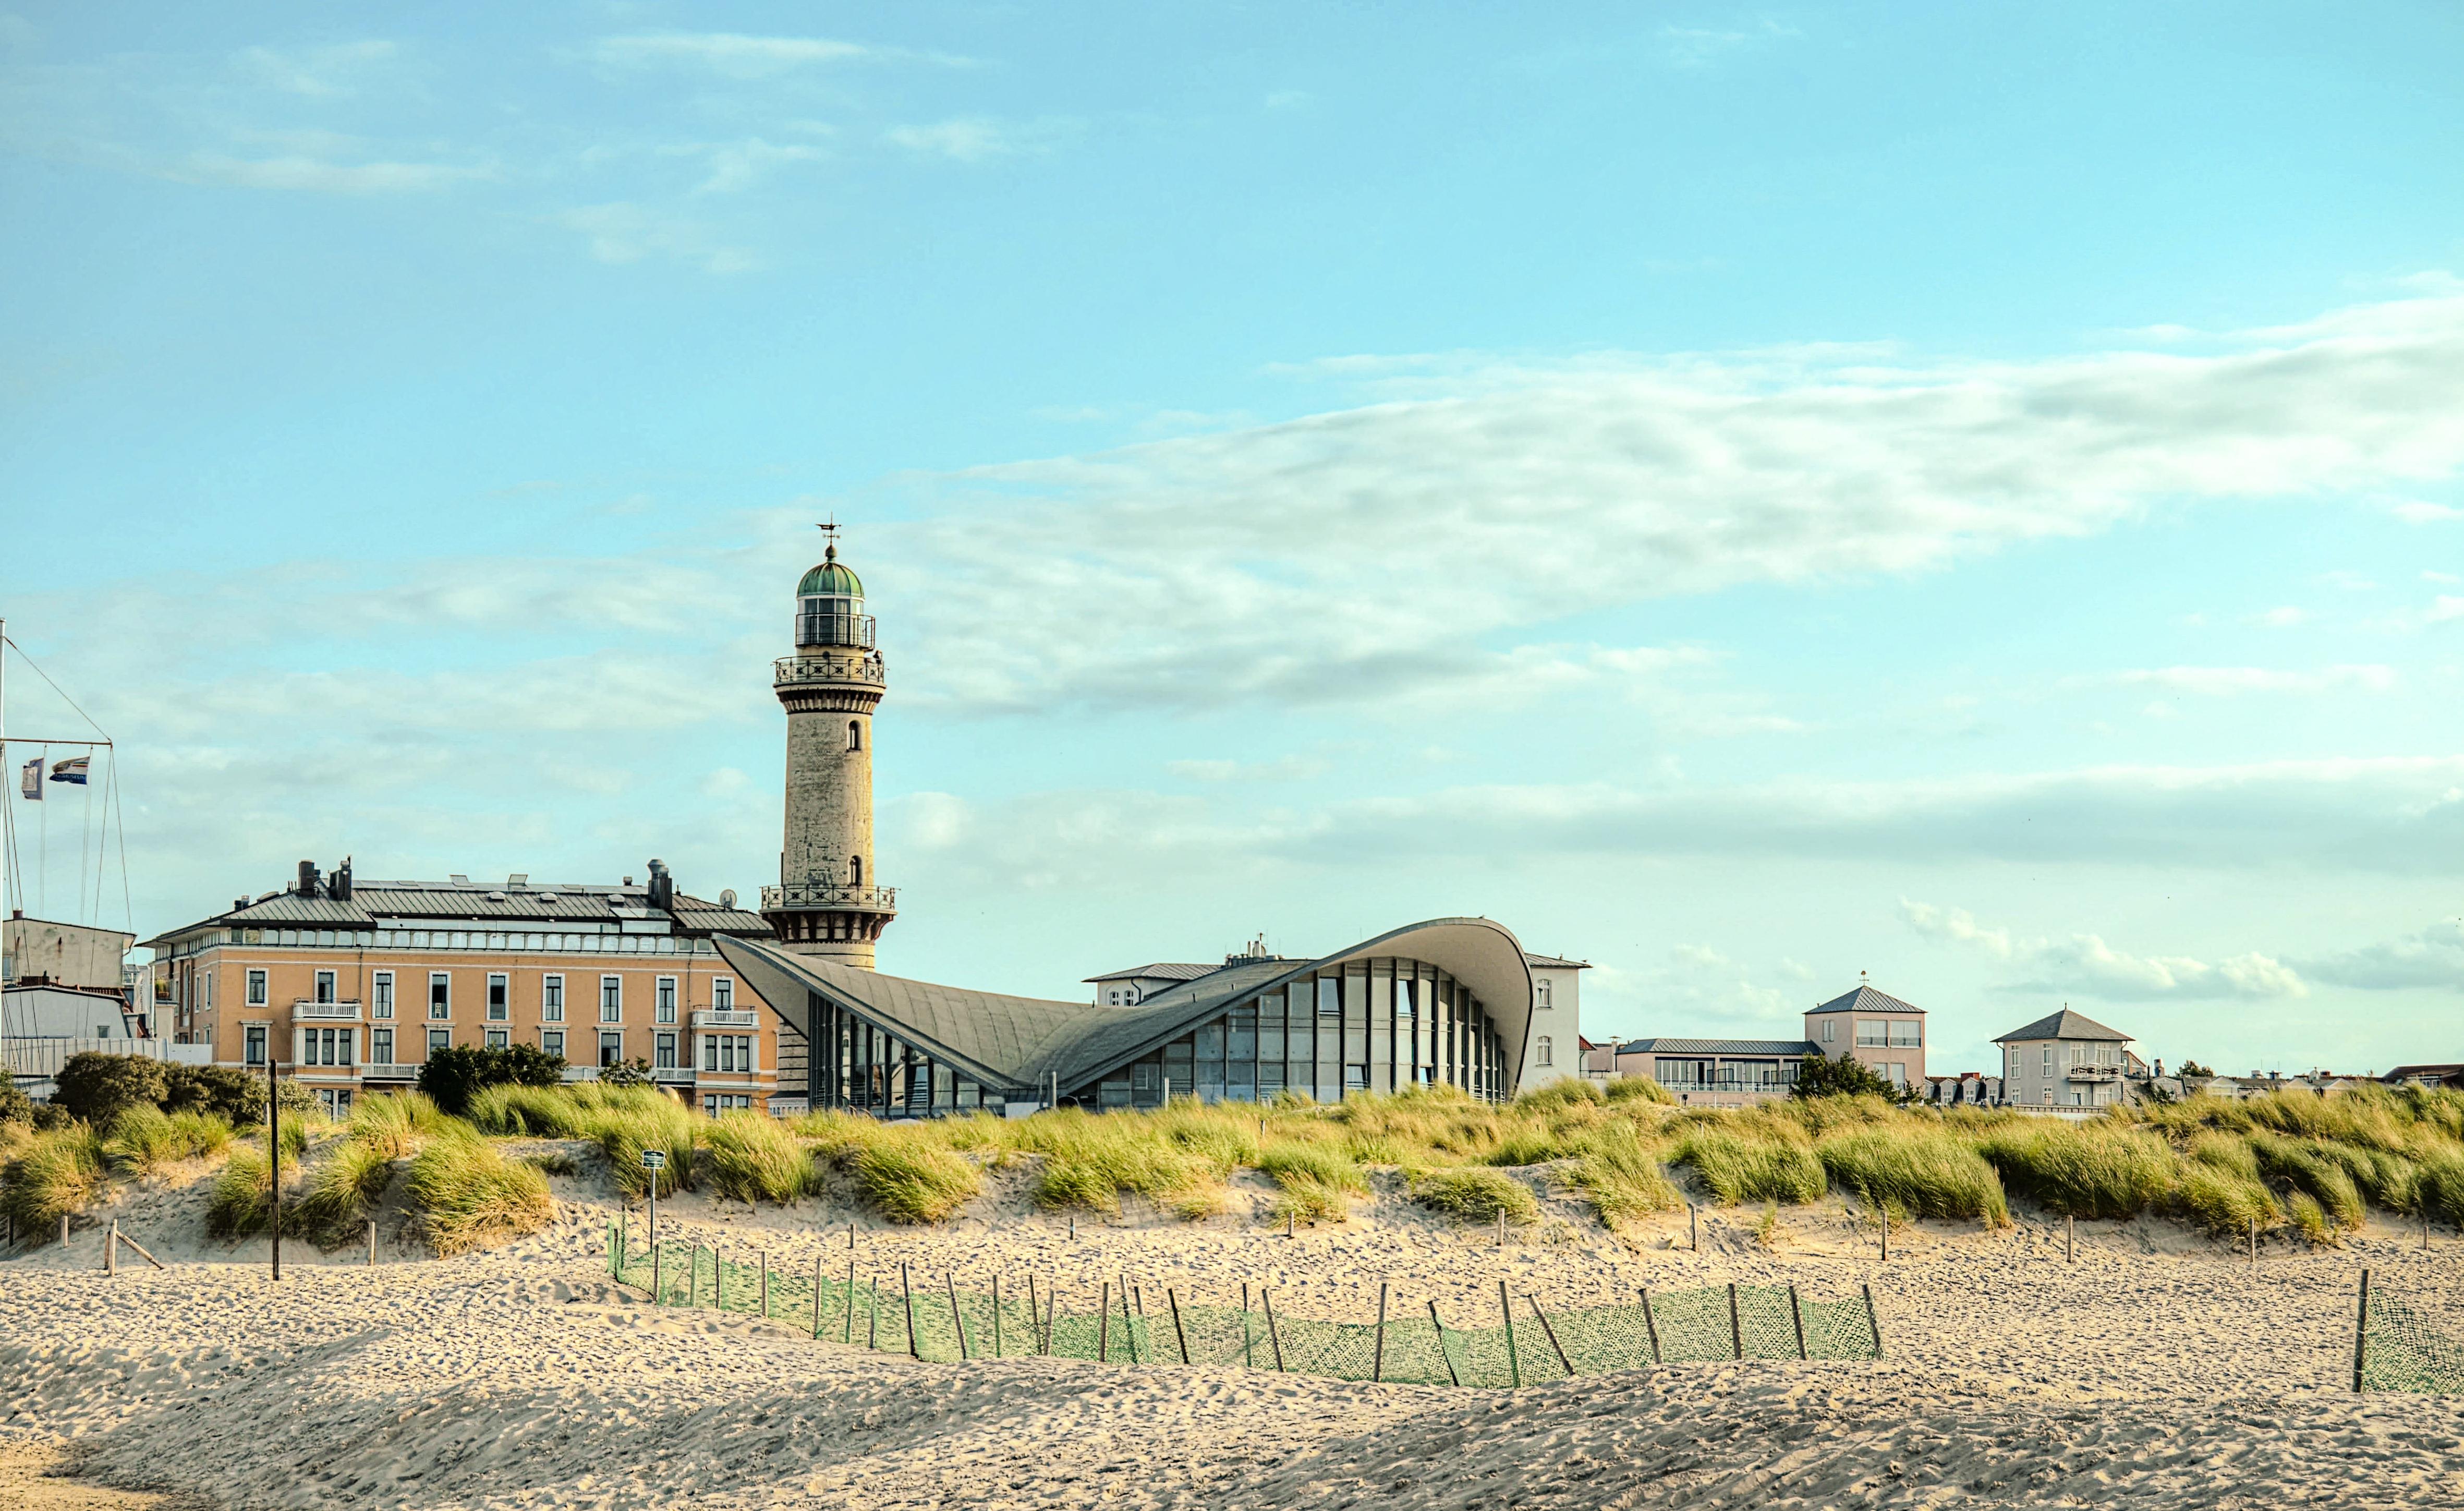 Wallpaper Baltic Sea Beach Lighthouse Skyline 4725x2897 Sabrina 1247443 Hd Wallpapers Wallhere